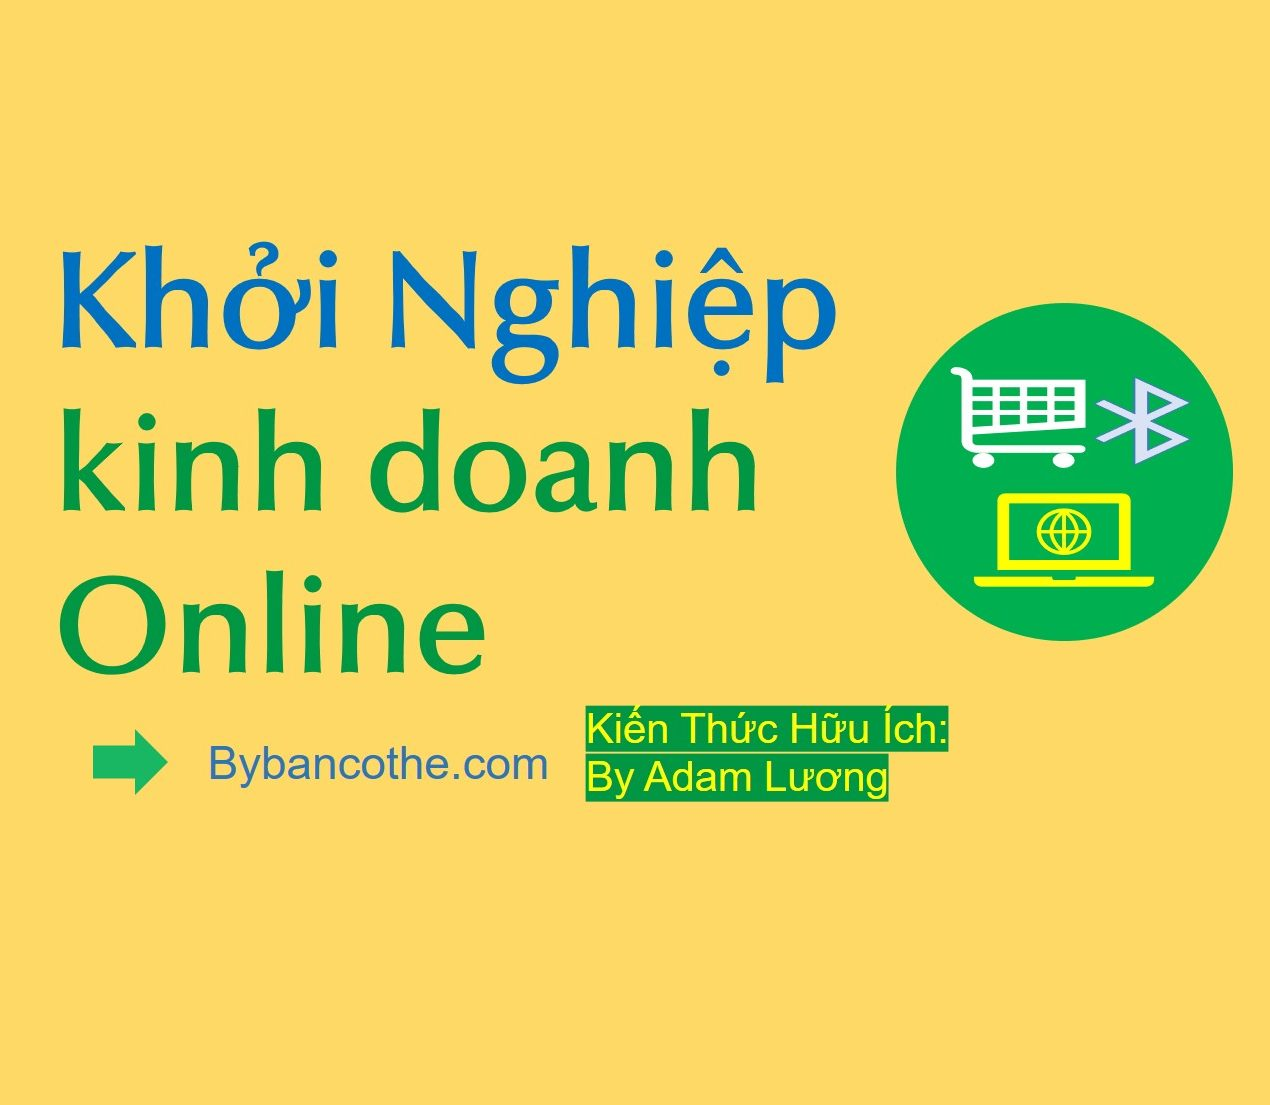 Khởi nghiệp kinh doanh online-bybancothe-com